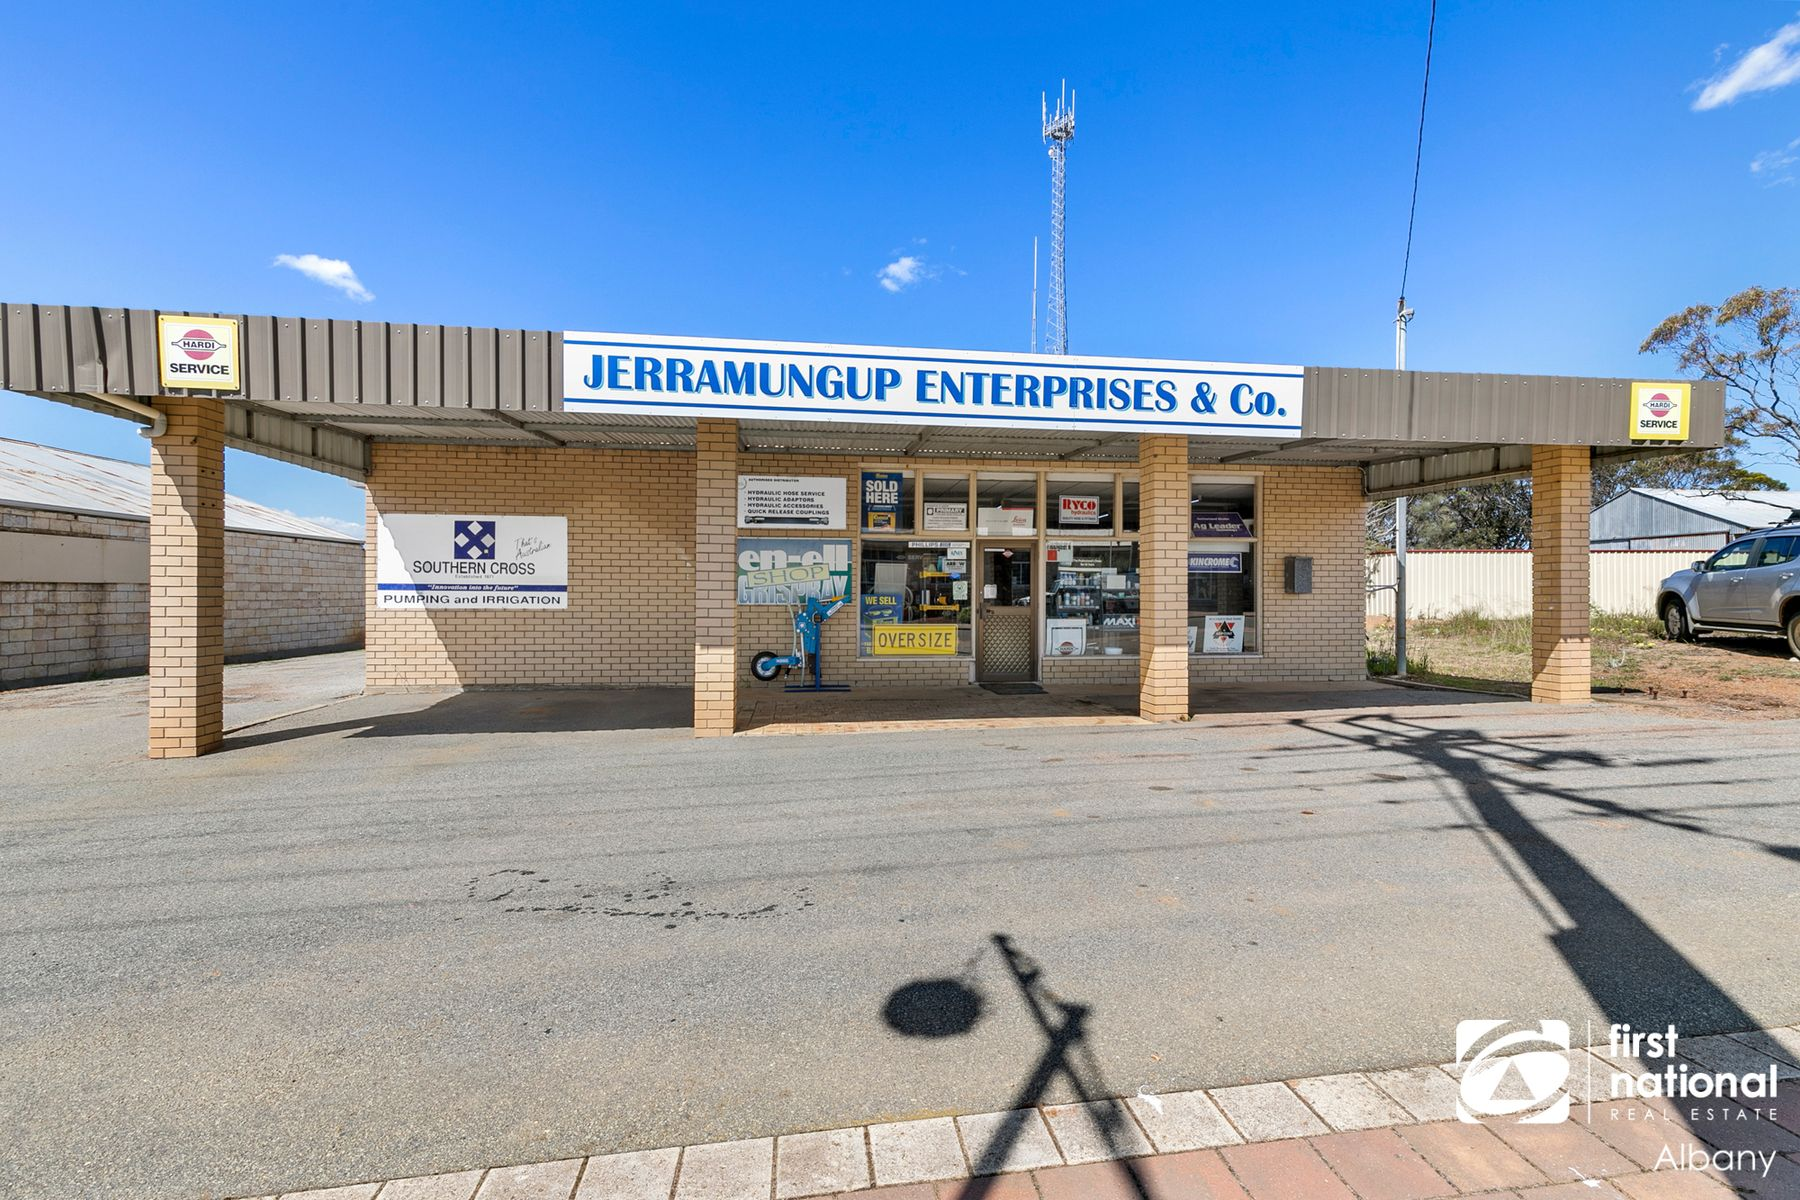 11 Tobruk Road, Jerramungup, WA 6337